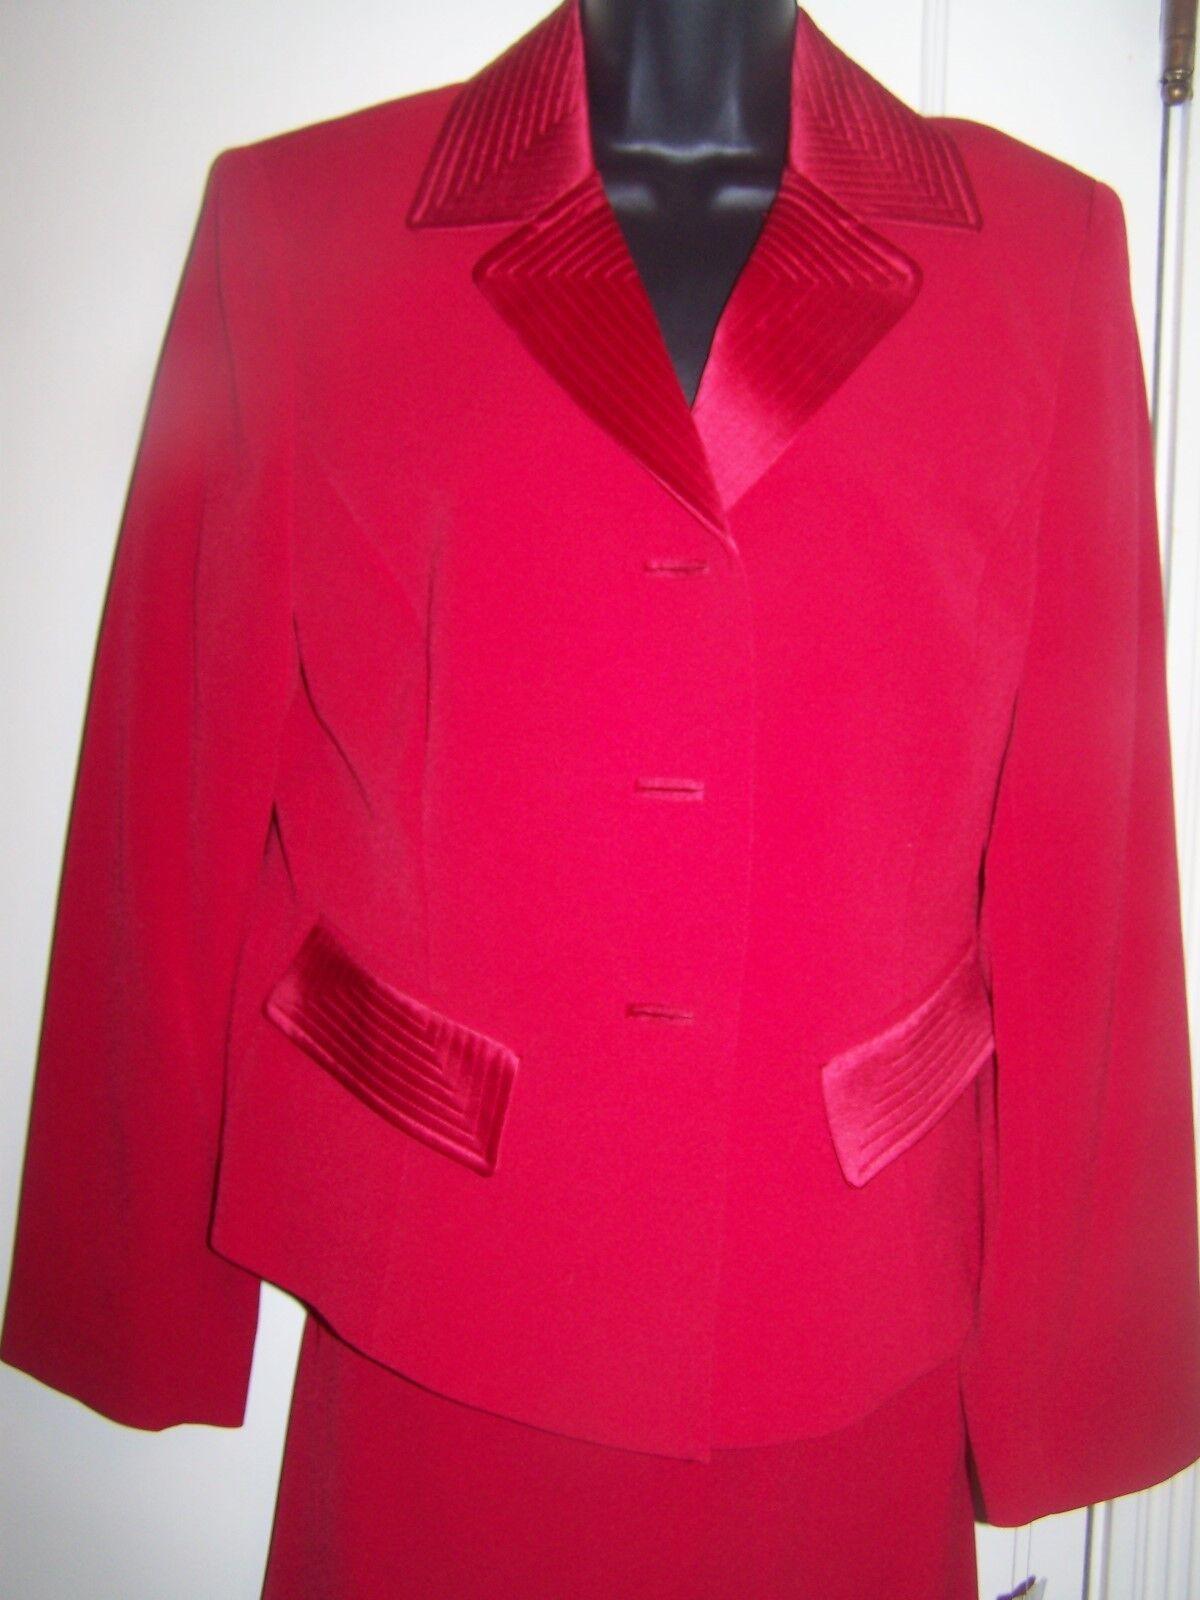 Evan-Picone Cherry Red Blazer & Skirt Suit Satin Collar Size 10 NWT H2ii